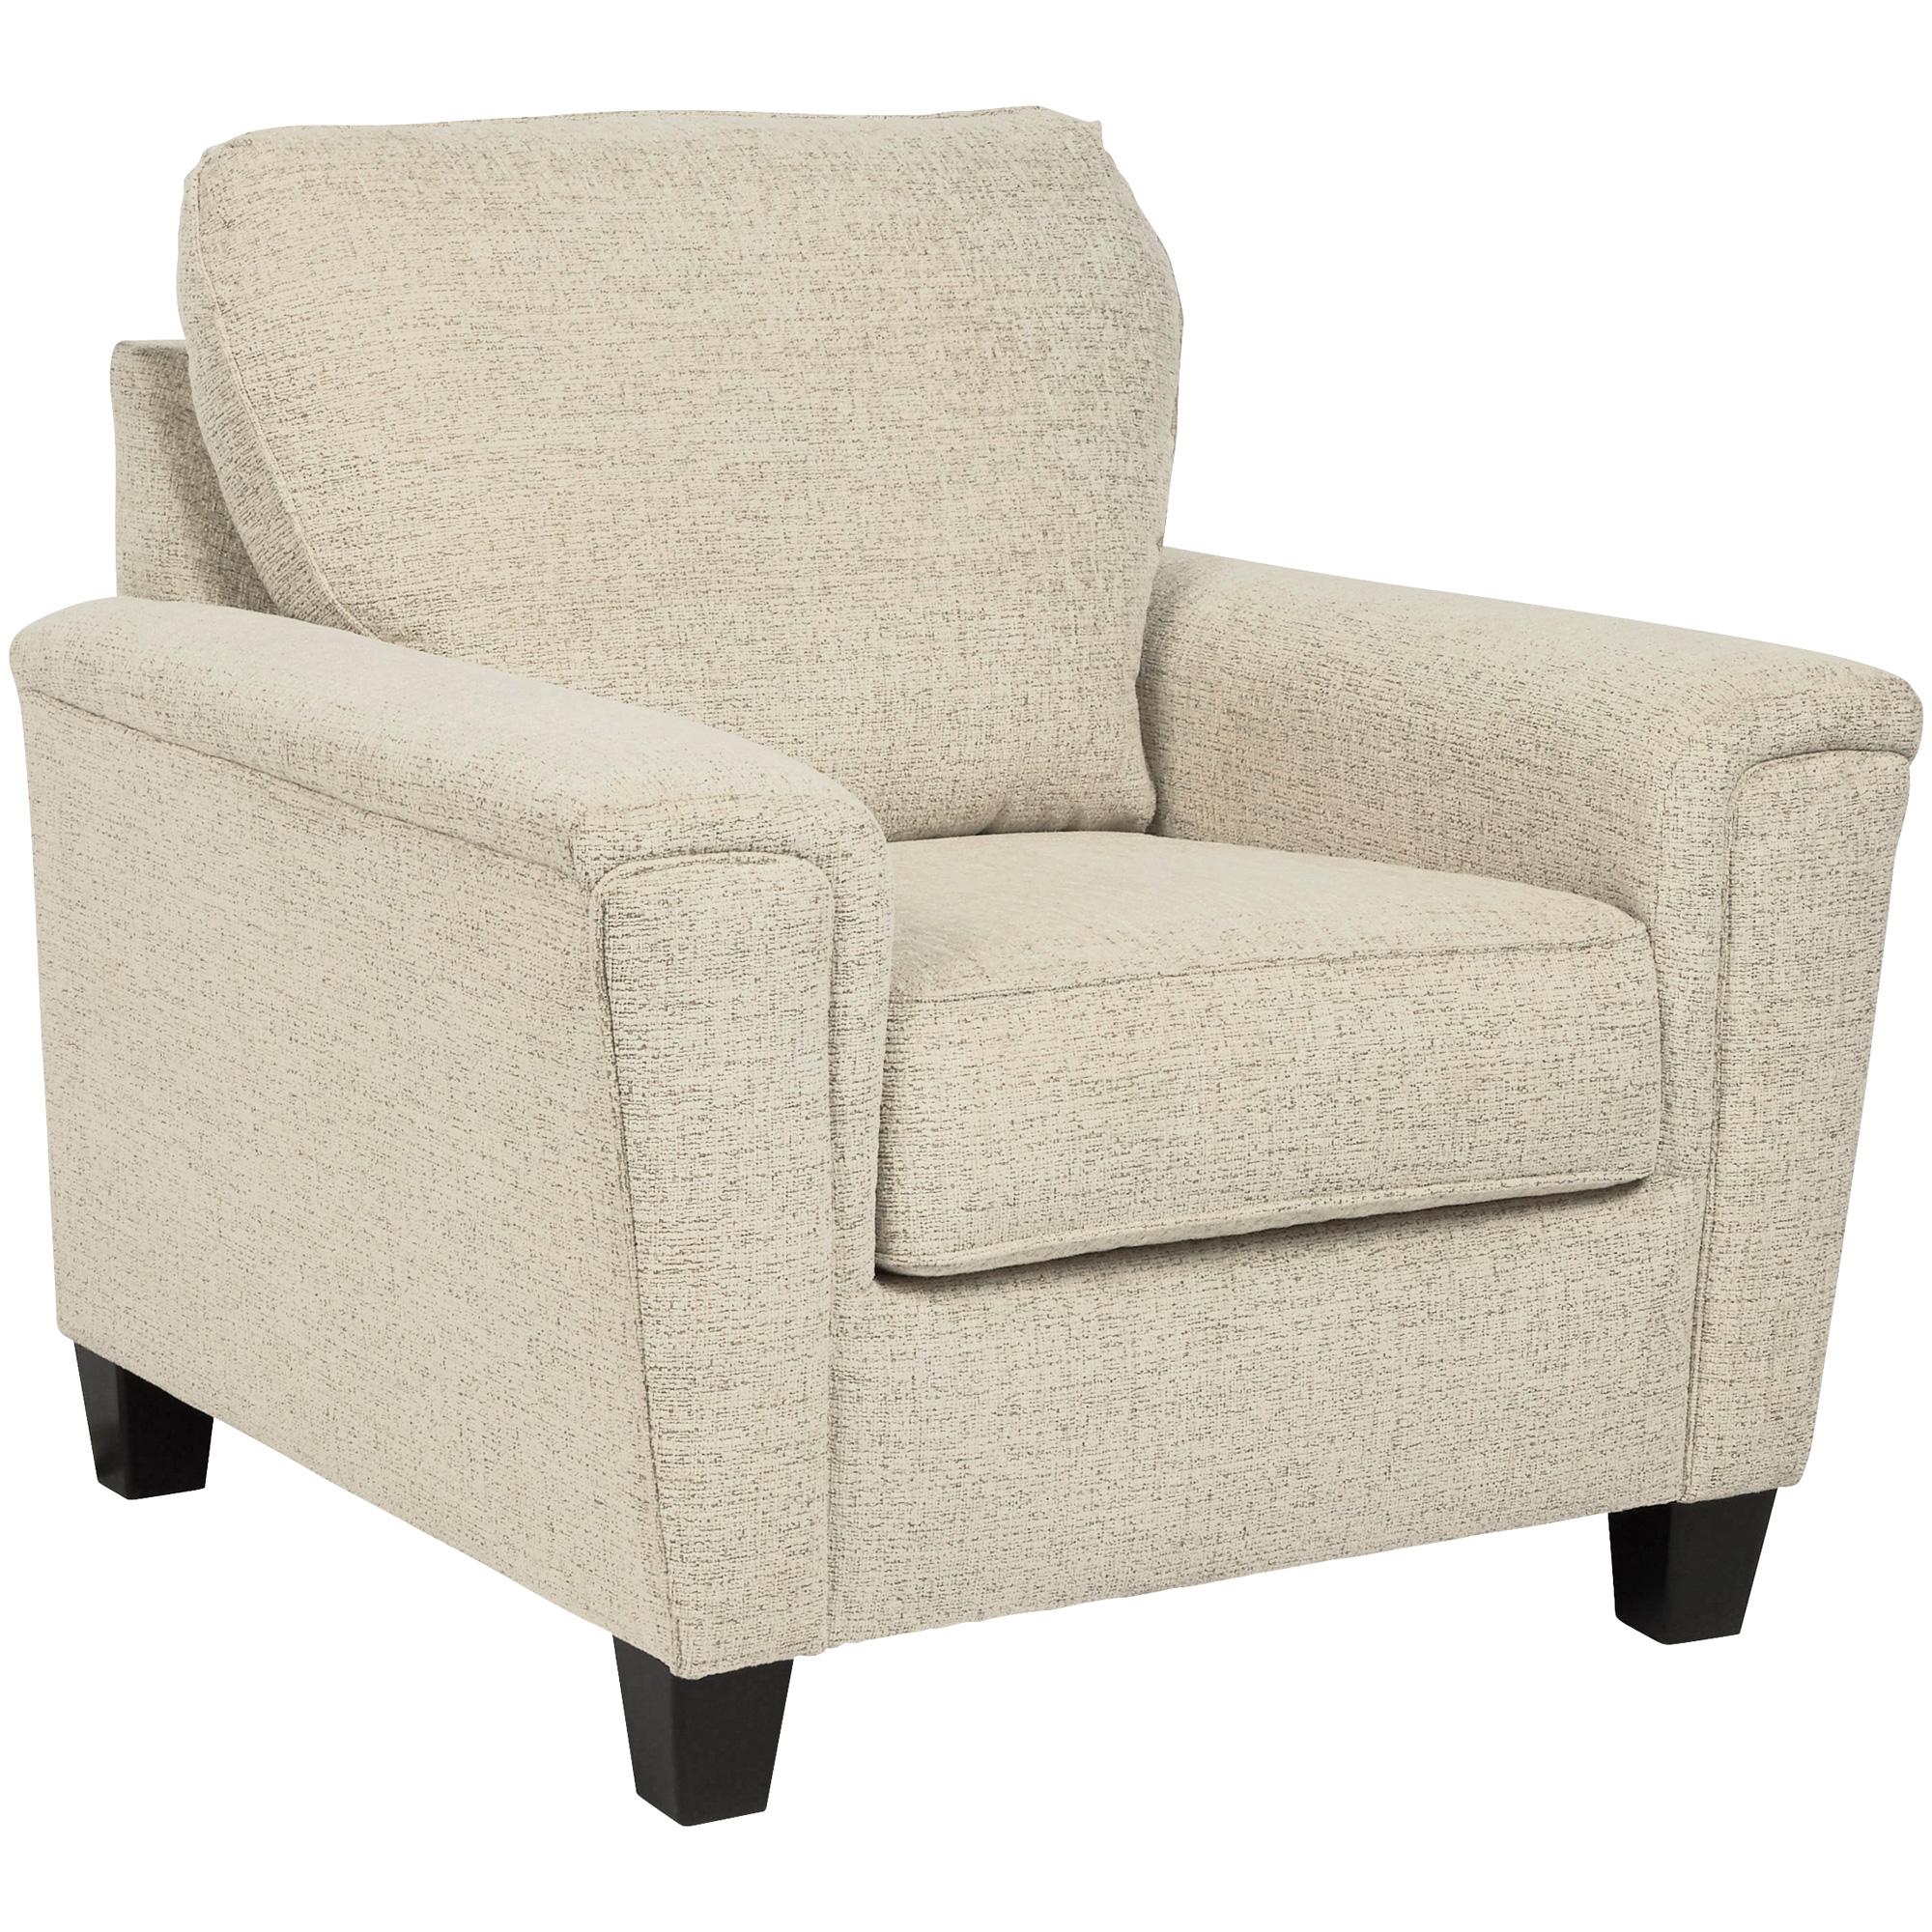 Ashley Furniture | Abinger Natural Chair